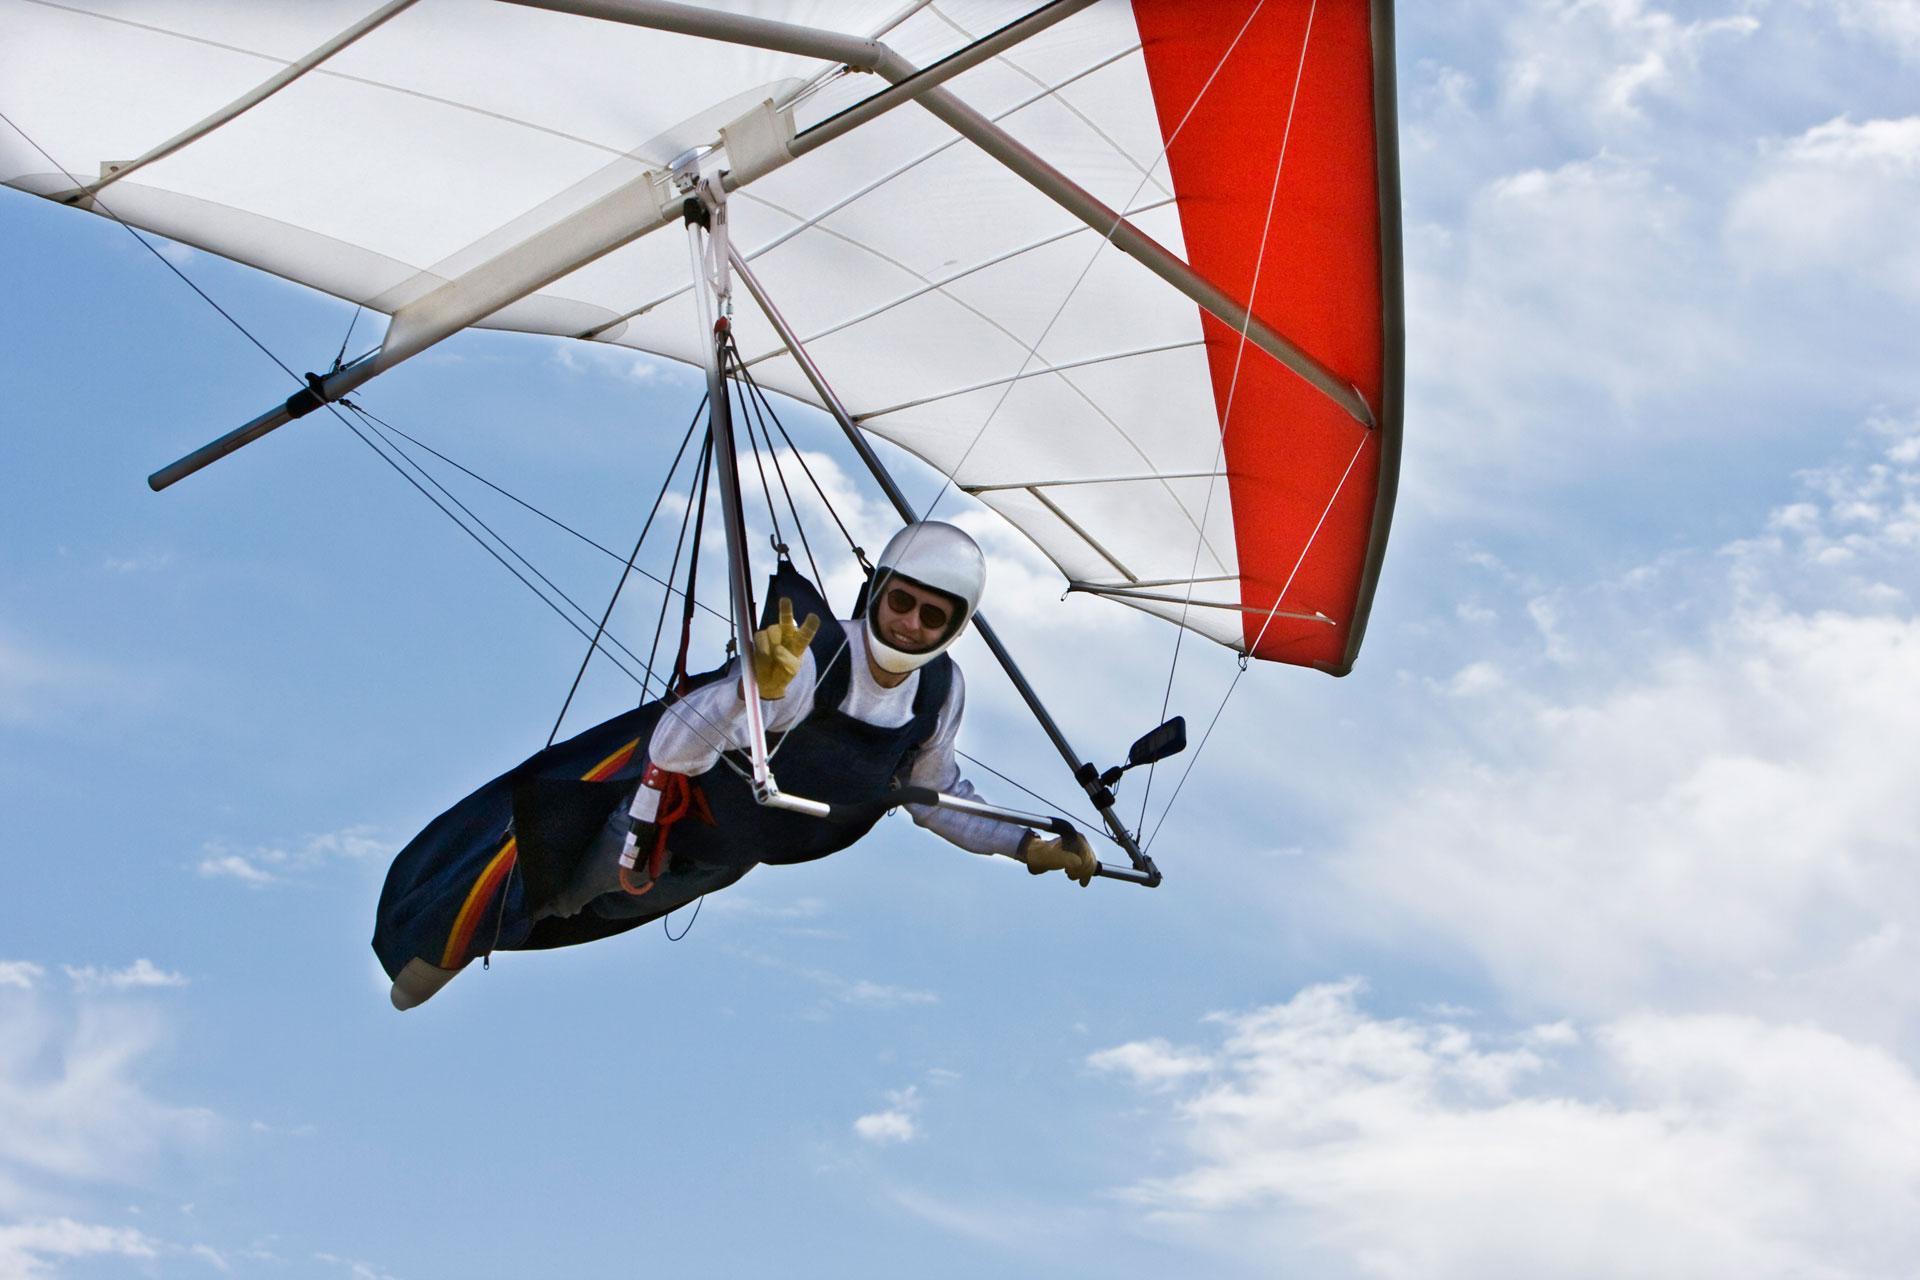 Paragliding or hang-gliding